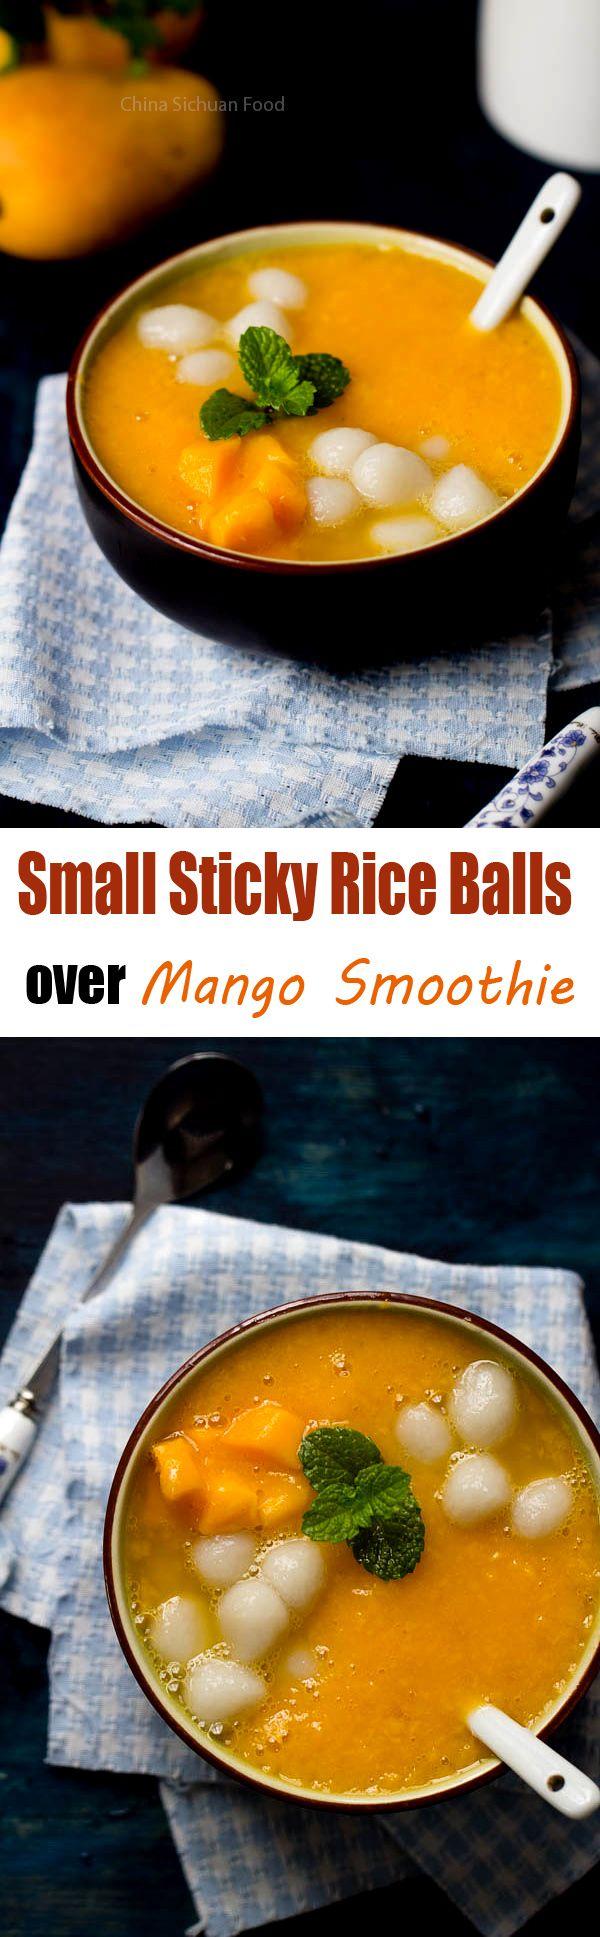 Small Sticky Rice Balls over Mango Smoothie   ChinaSichuanFood.com